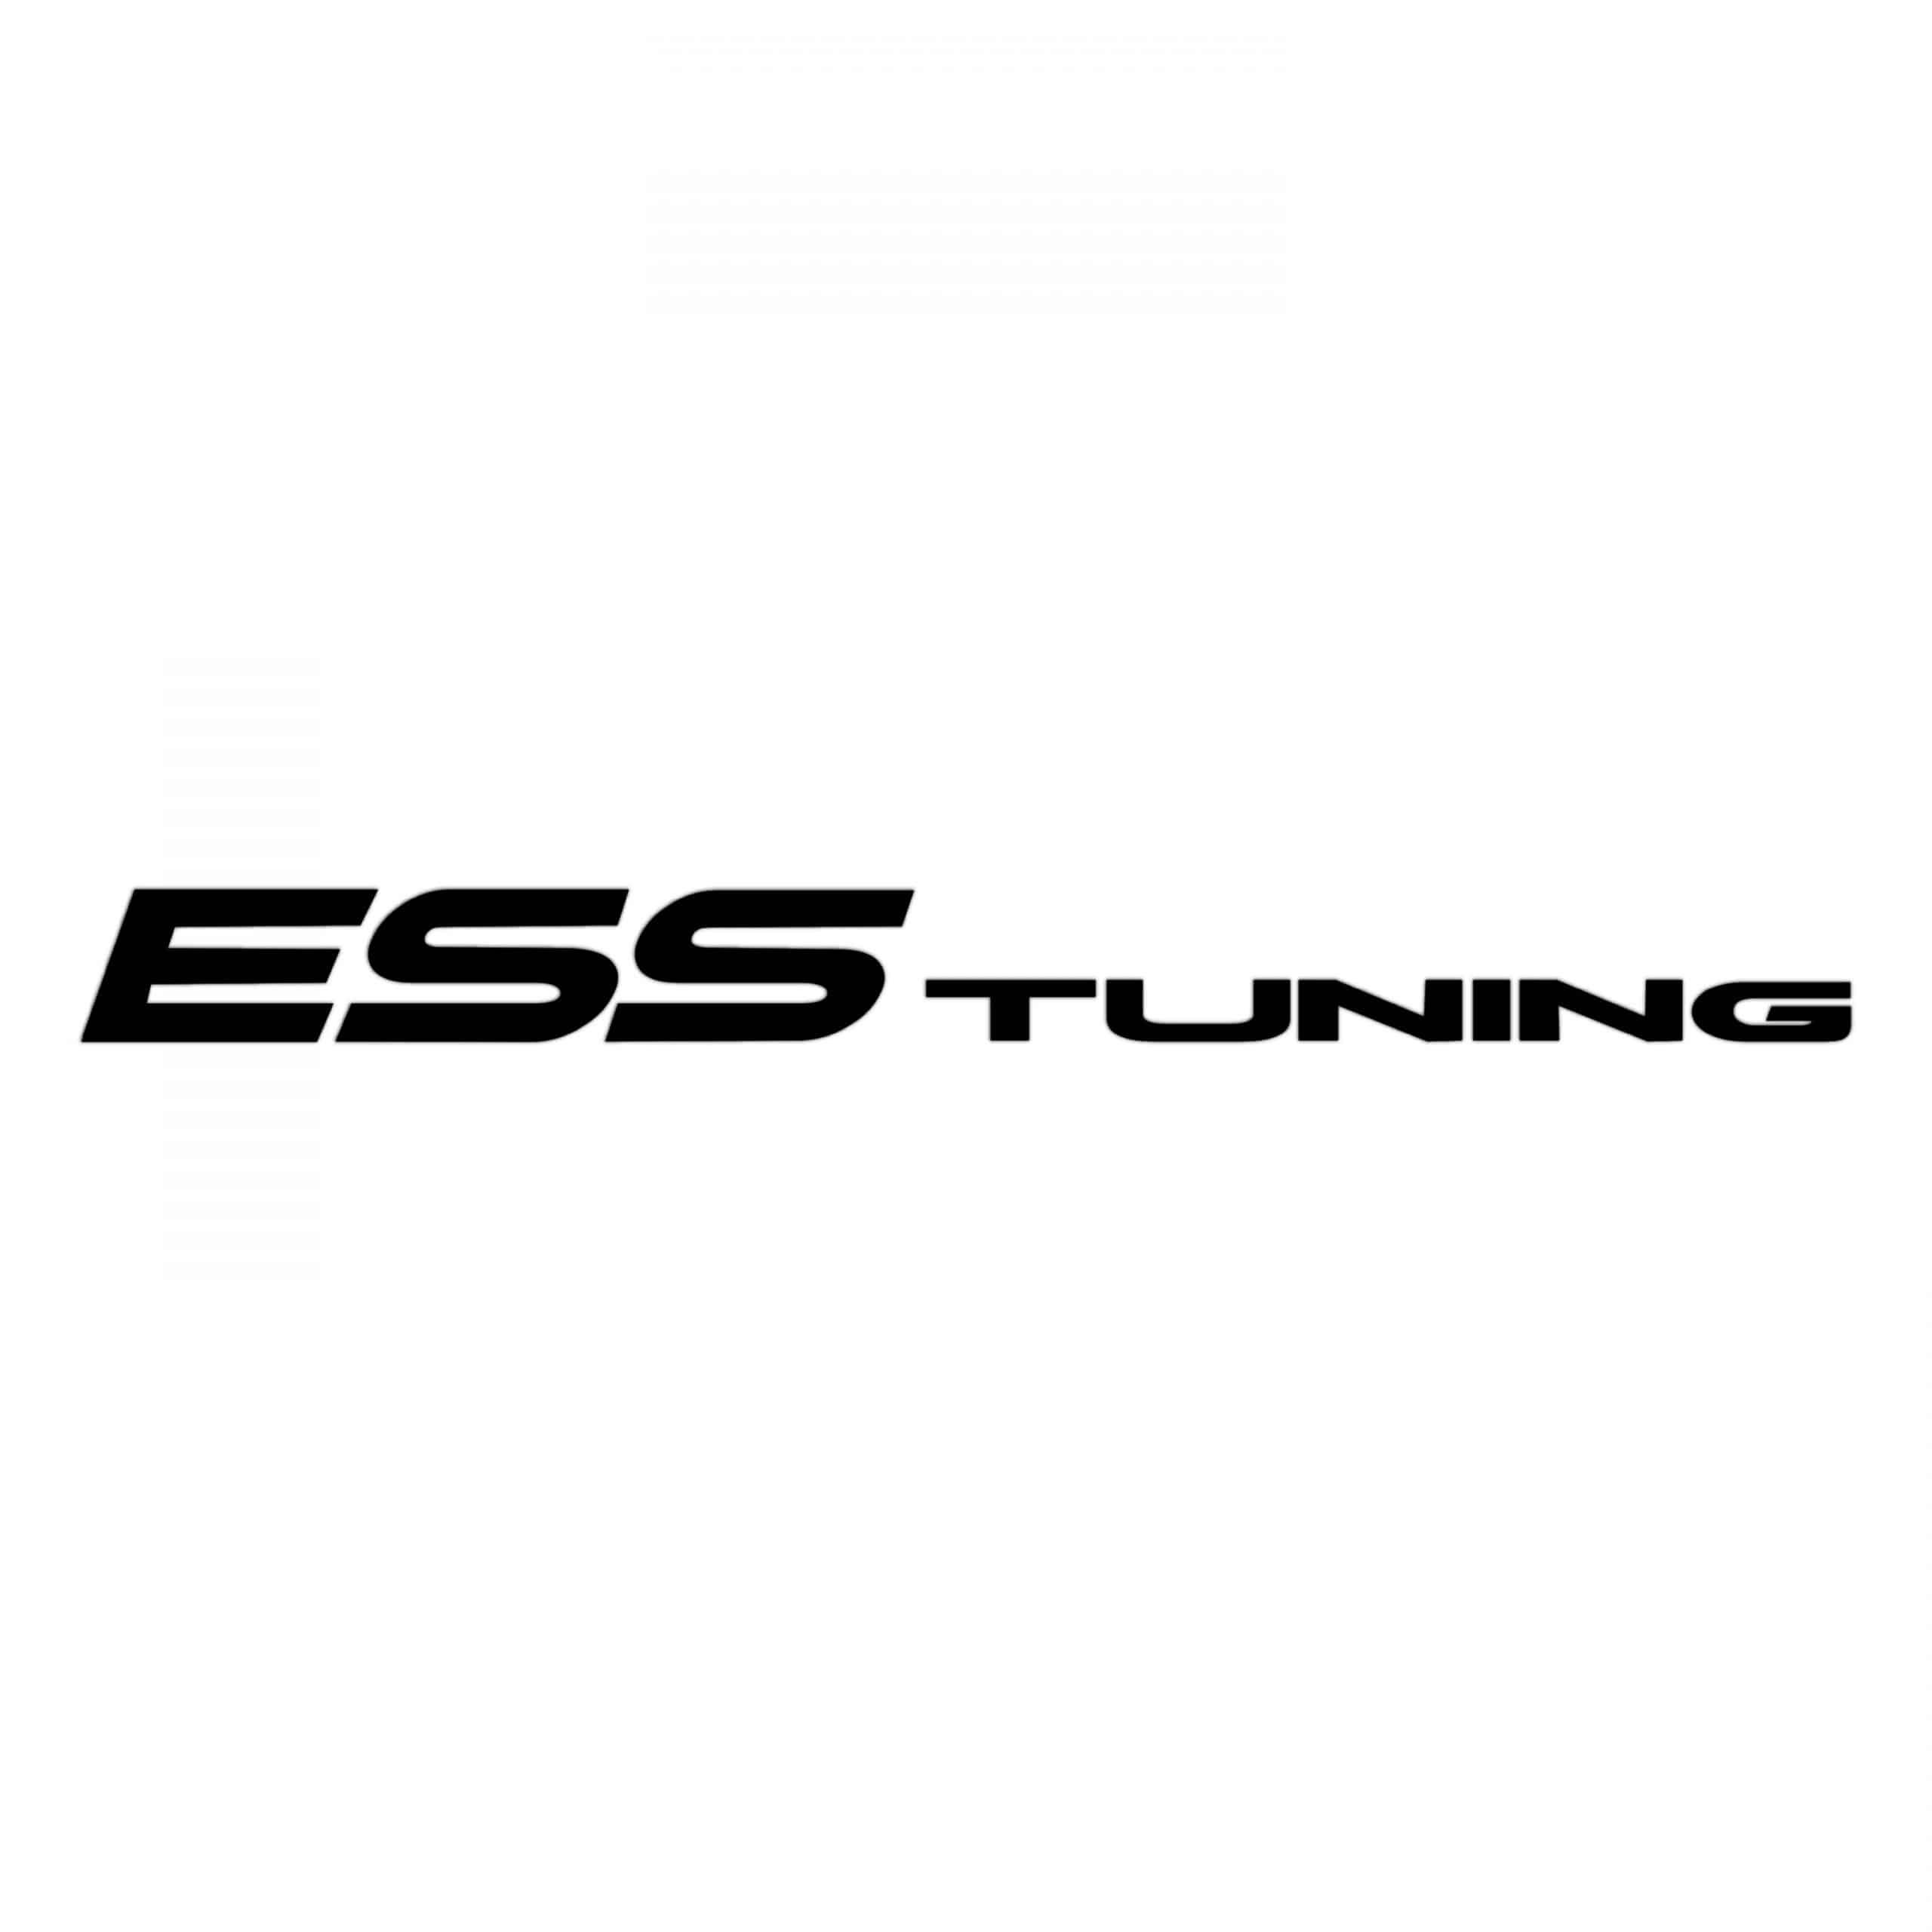 ESS Tuning